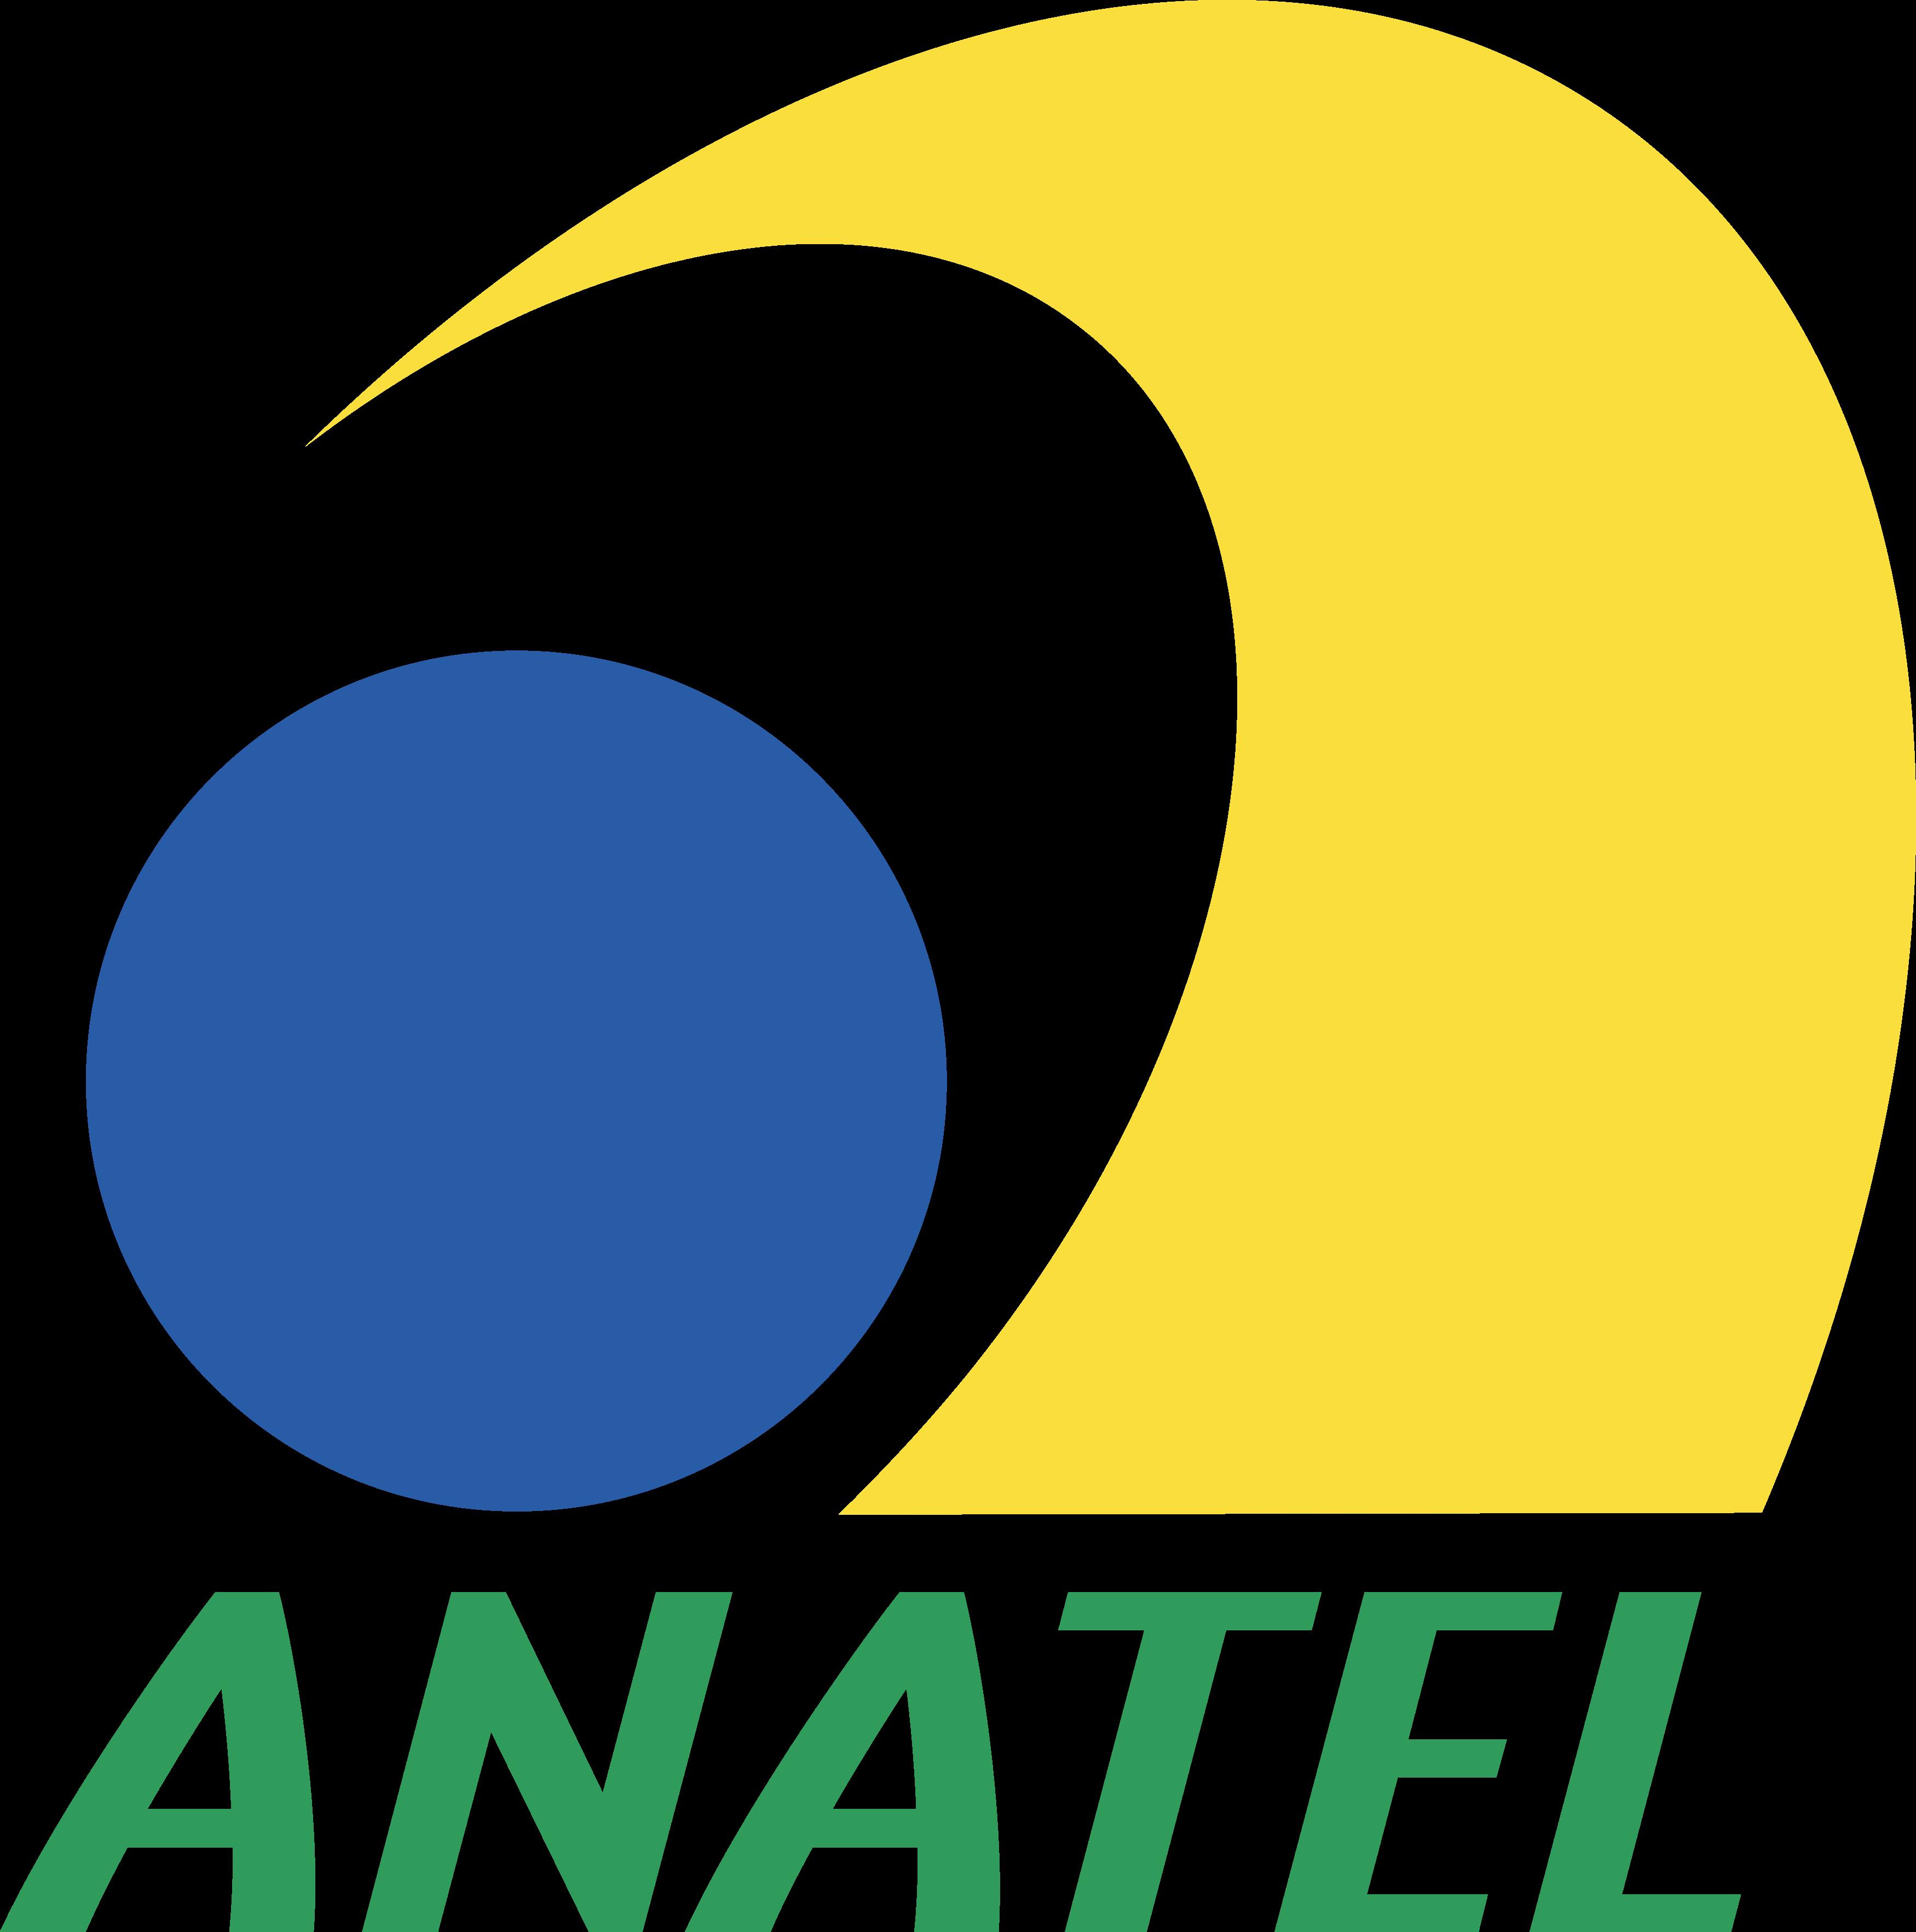 Anatel Logo.